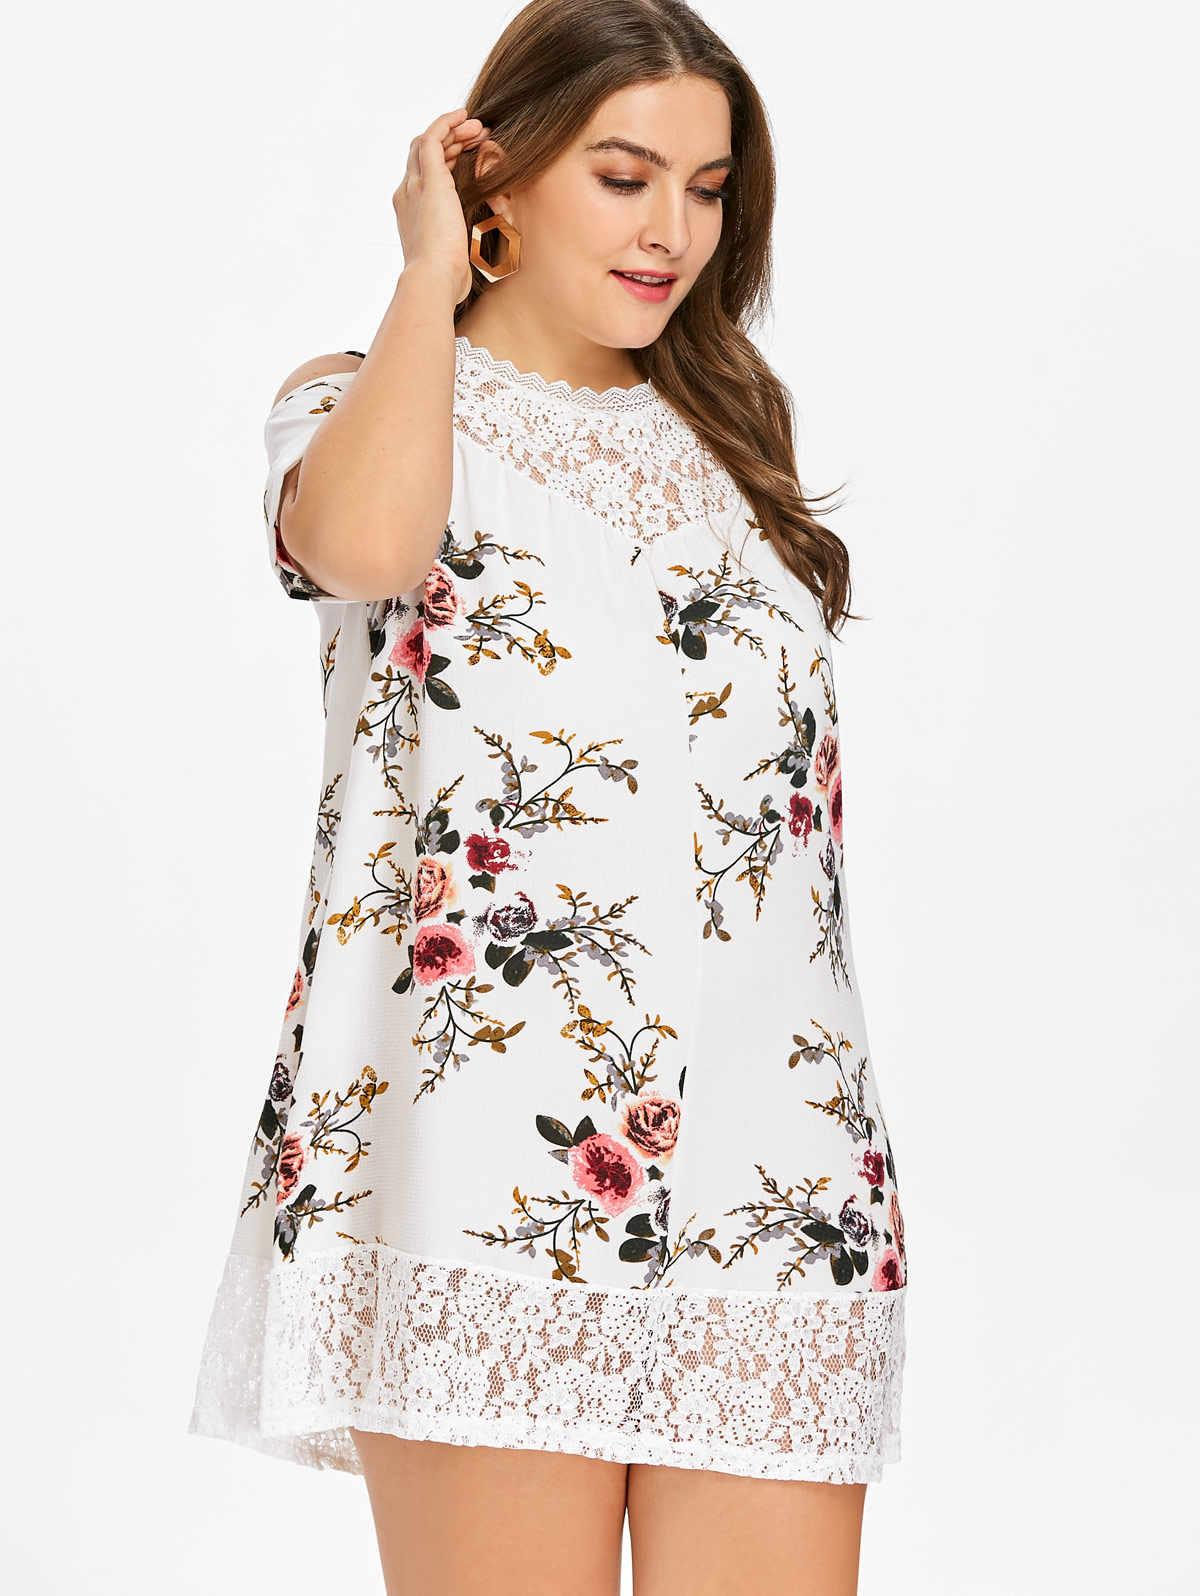 2a4c895bd1023 Wipalo Plus Size 5XL Floral Print Cold Shoulder Dress Summer Short Sleeves  Lace Trim Babydoll Mini Dress Vestidos Big Size